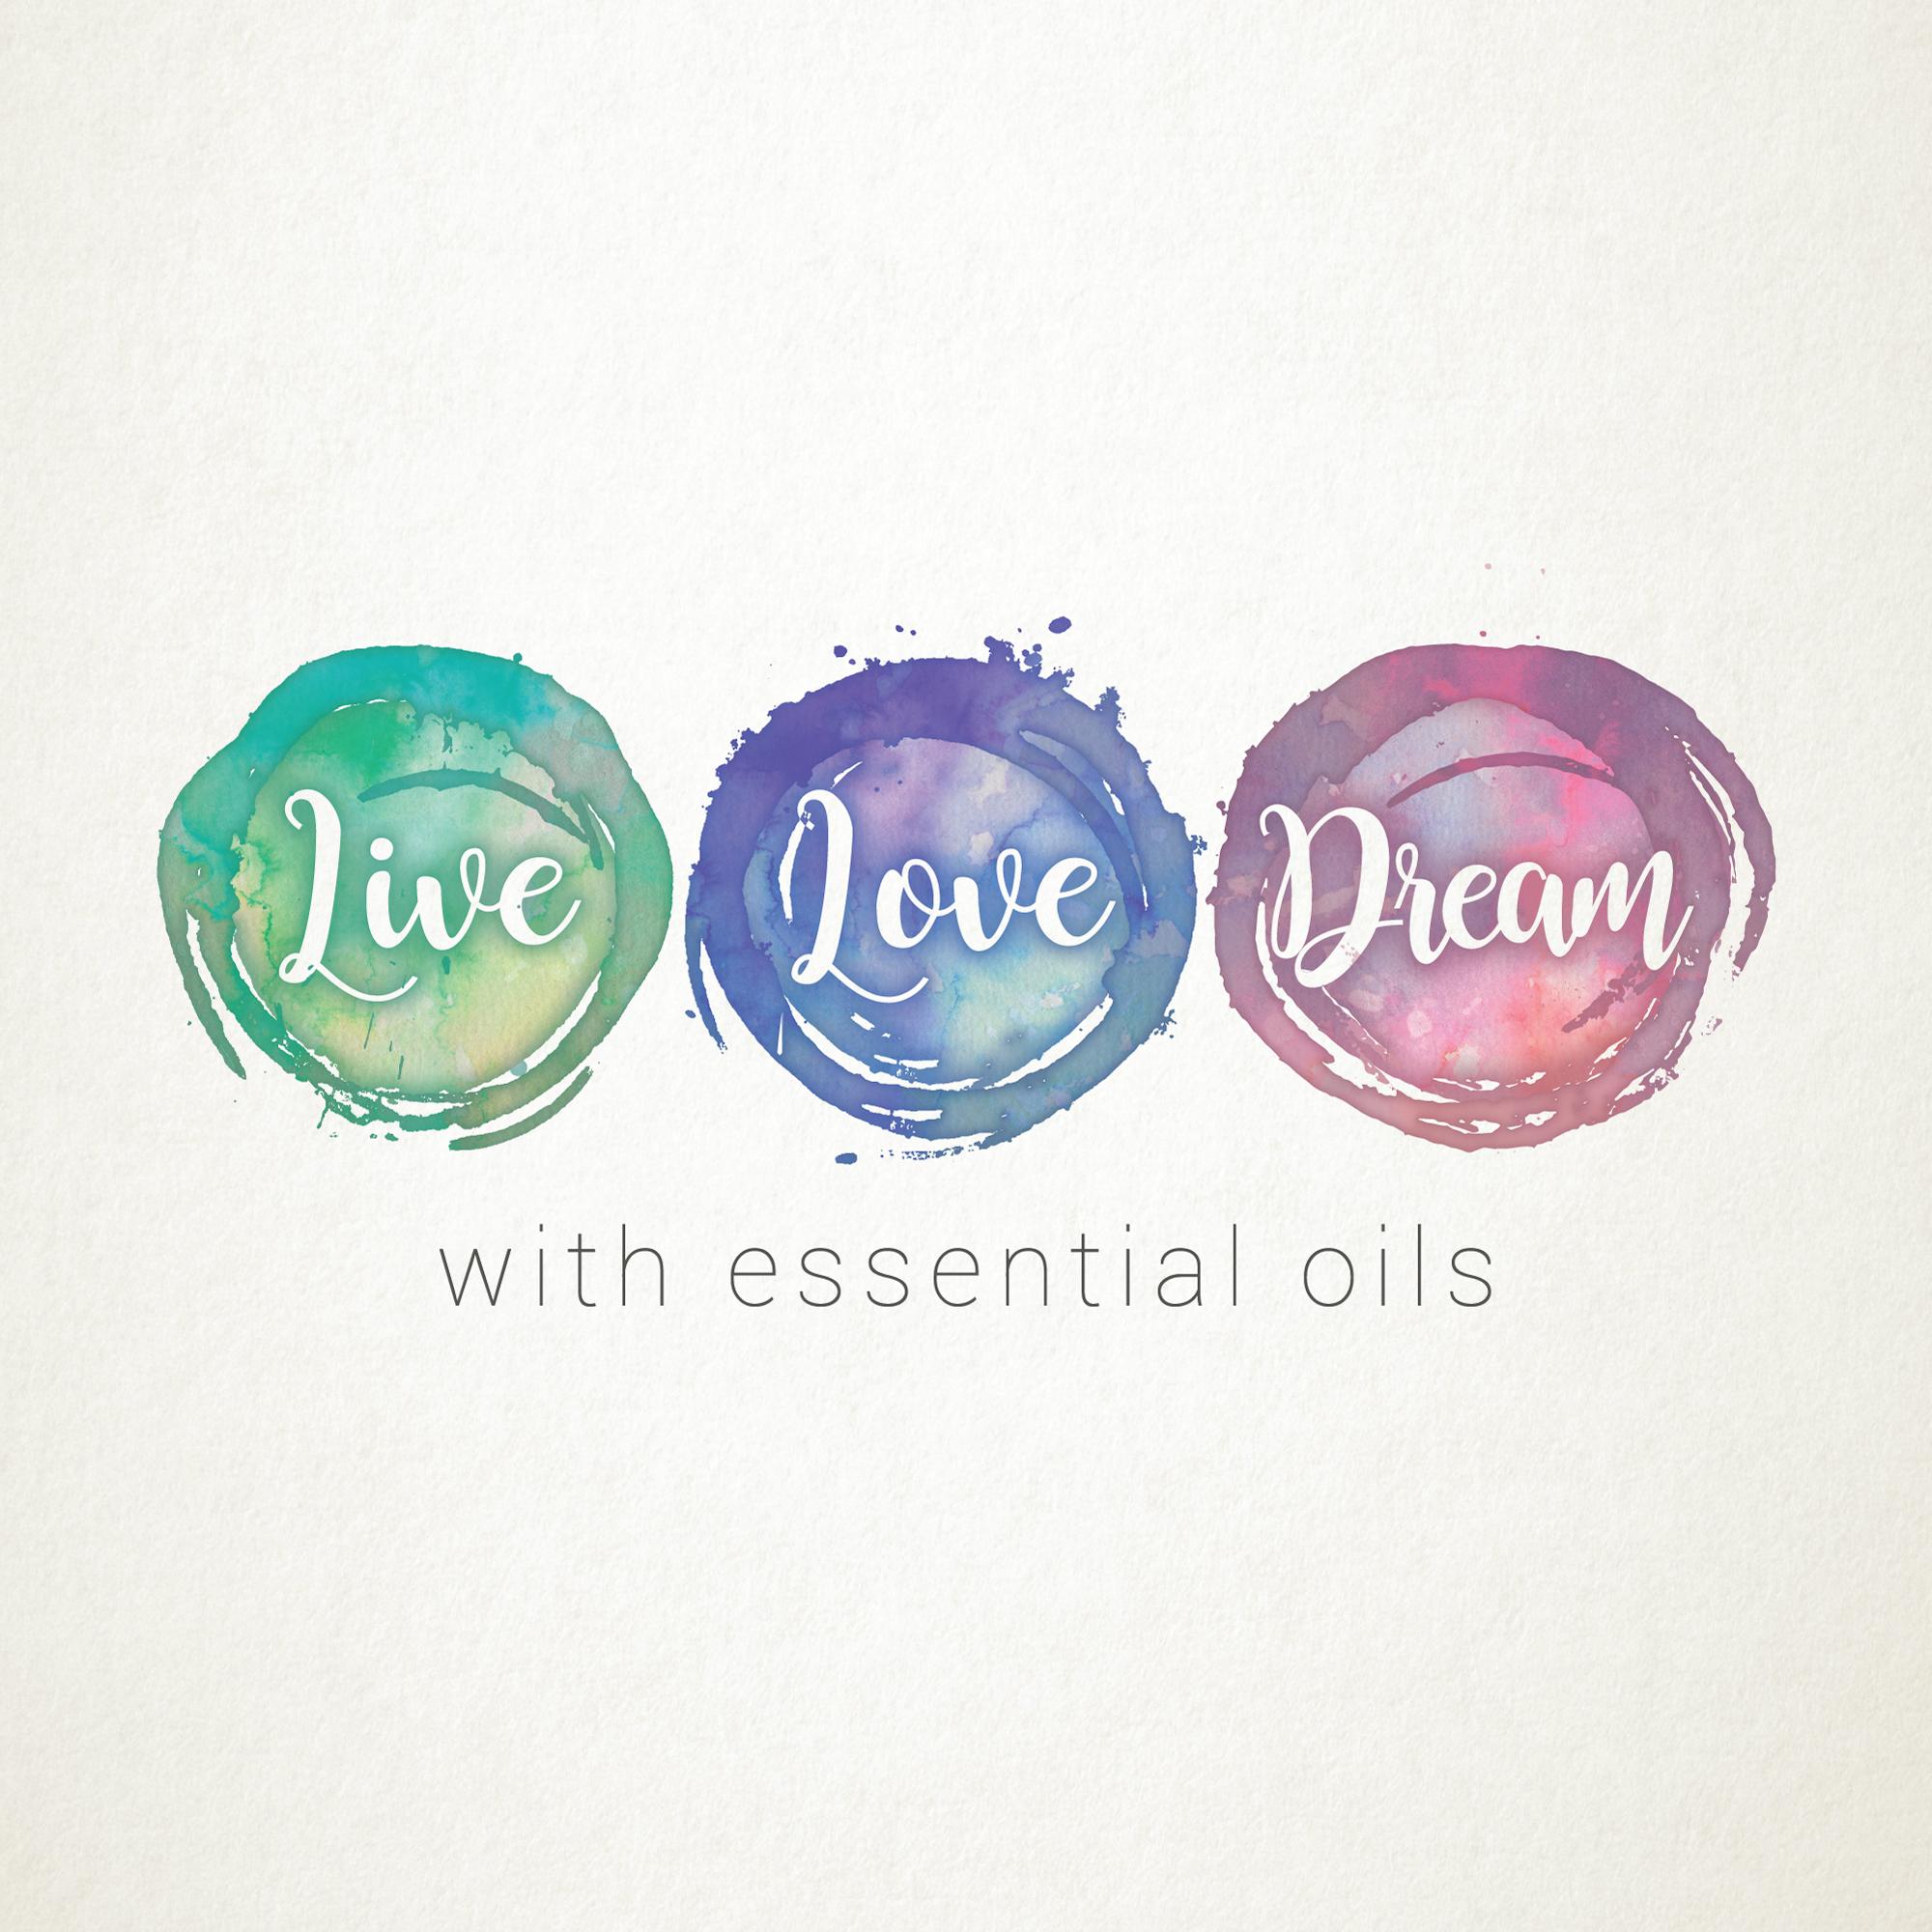 Live Love Dream | Logo Design by Corinne Jade